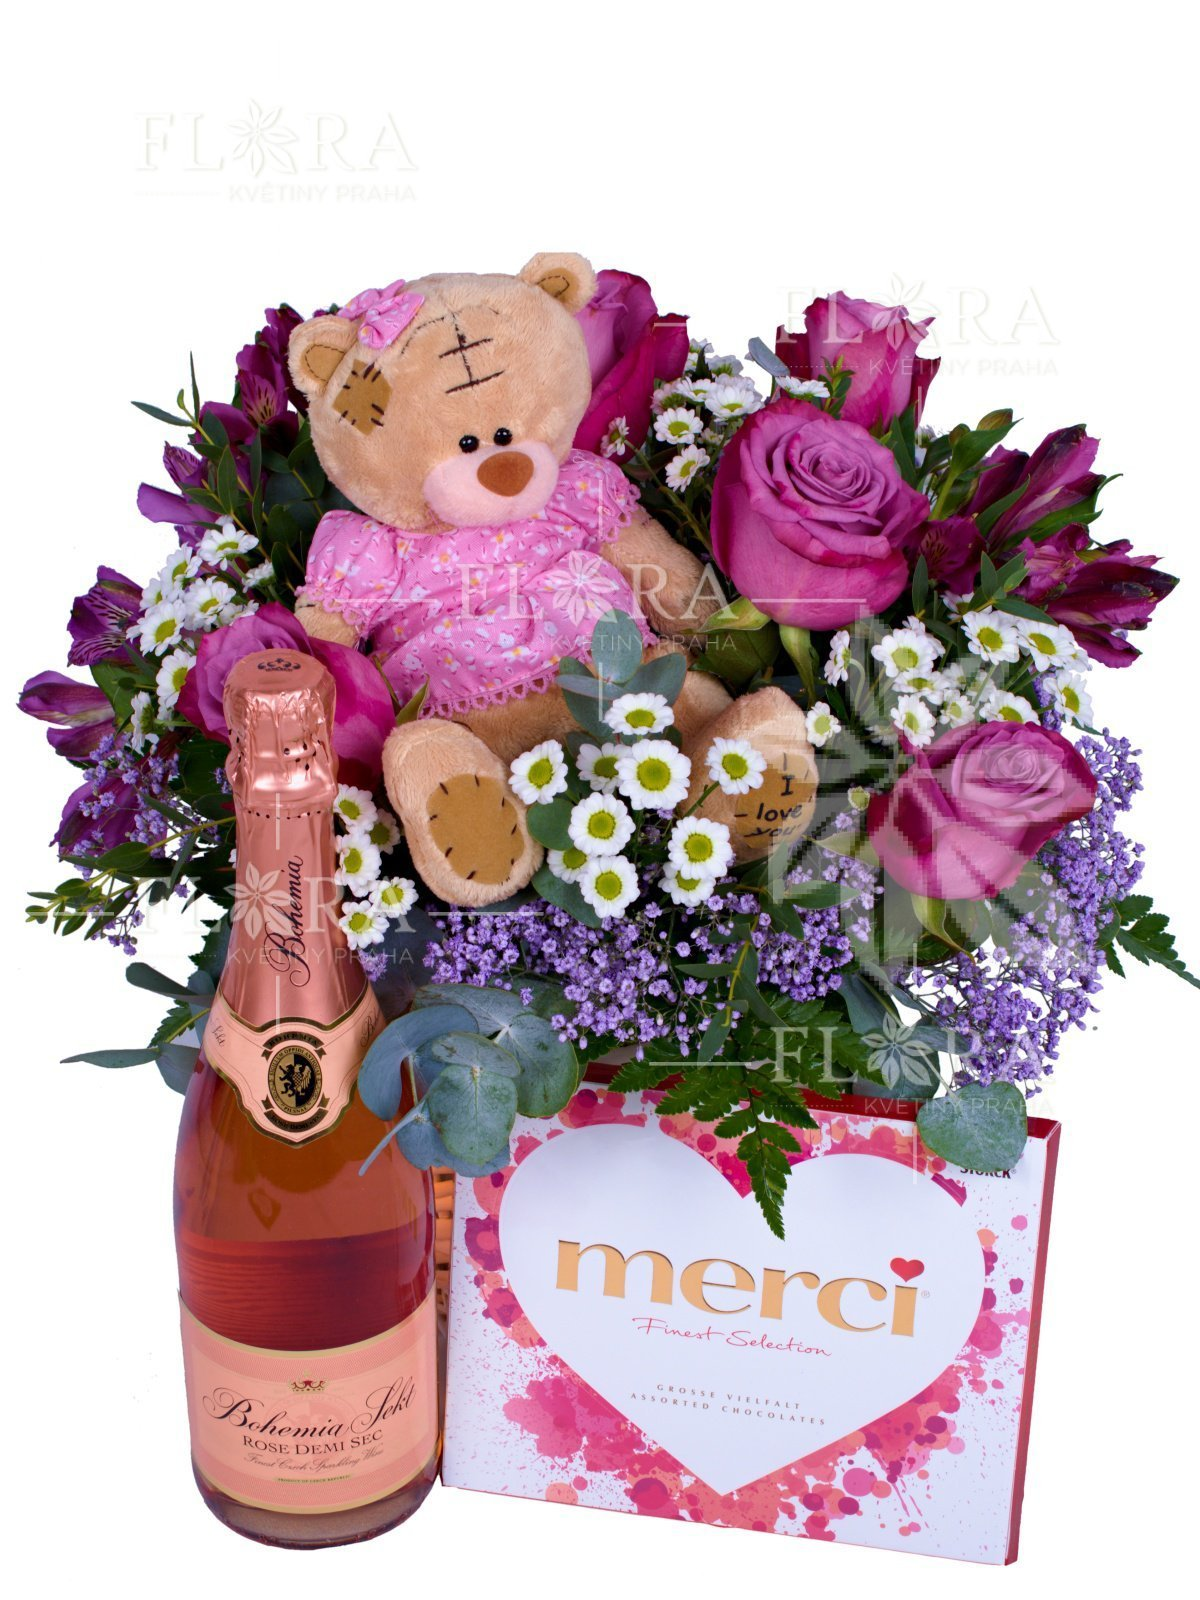 Flower basket violet merci a bottle of champagne mixed bouguet discount 100 k on your next purchase flower set beautiful flower basket izmirmasajfo